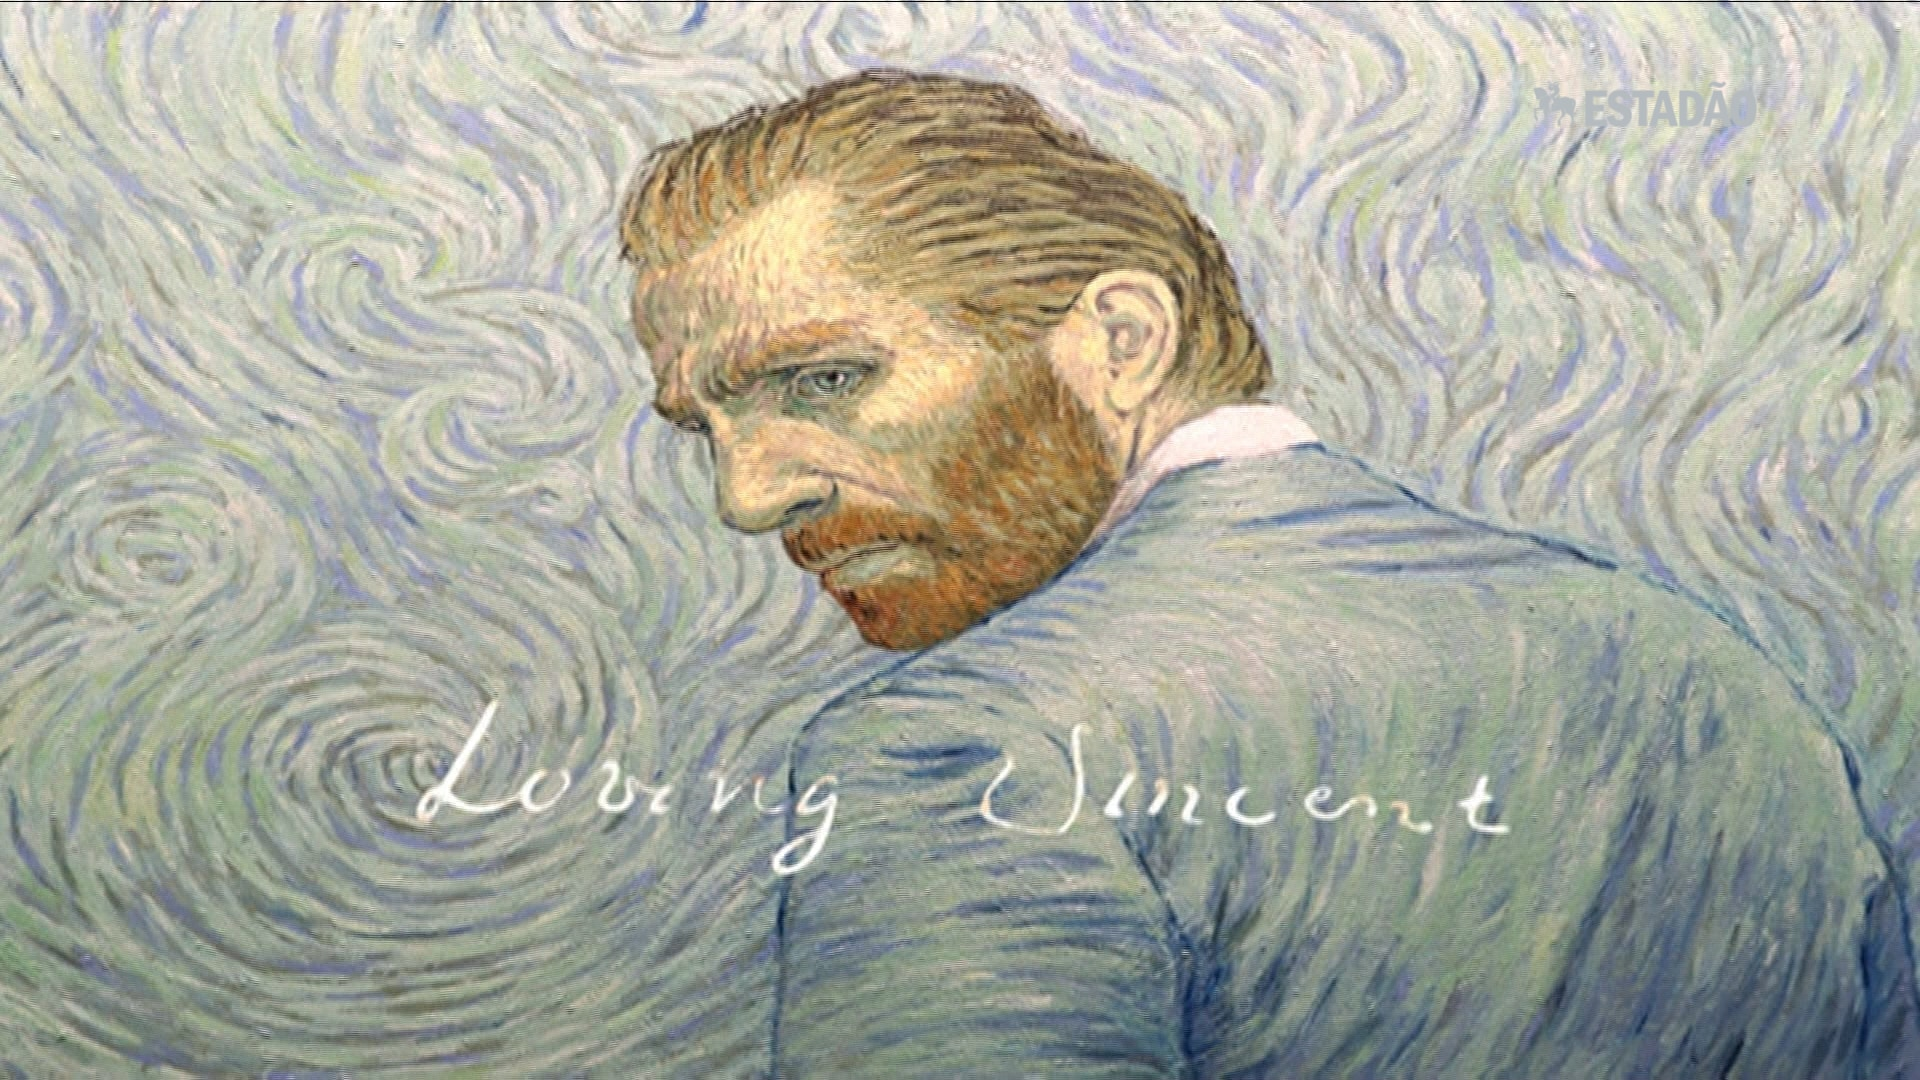 Filme sobre Van Gogh é feito com pinturas